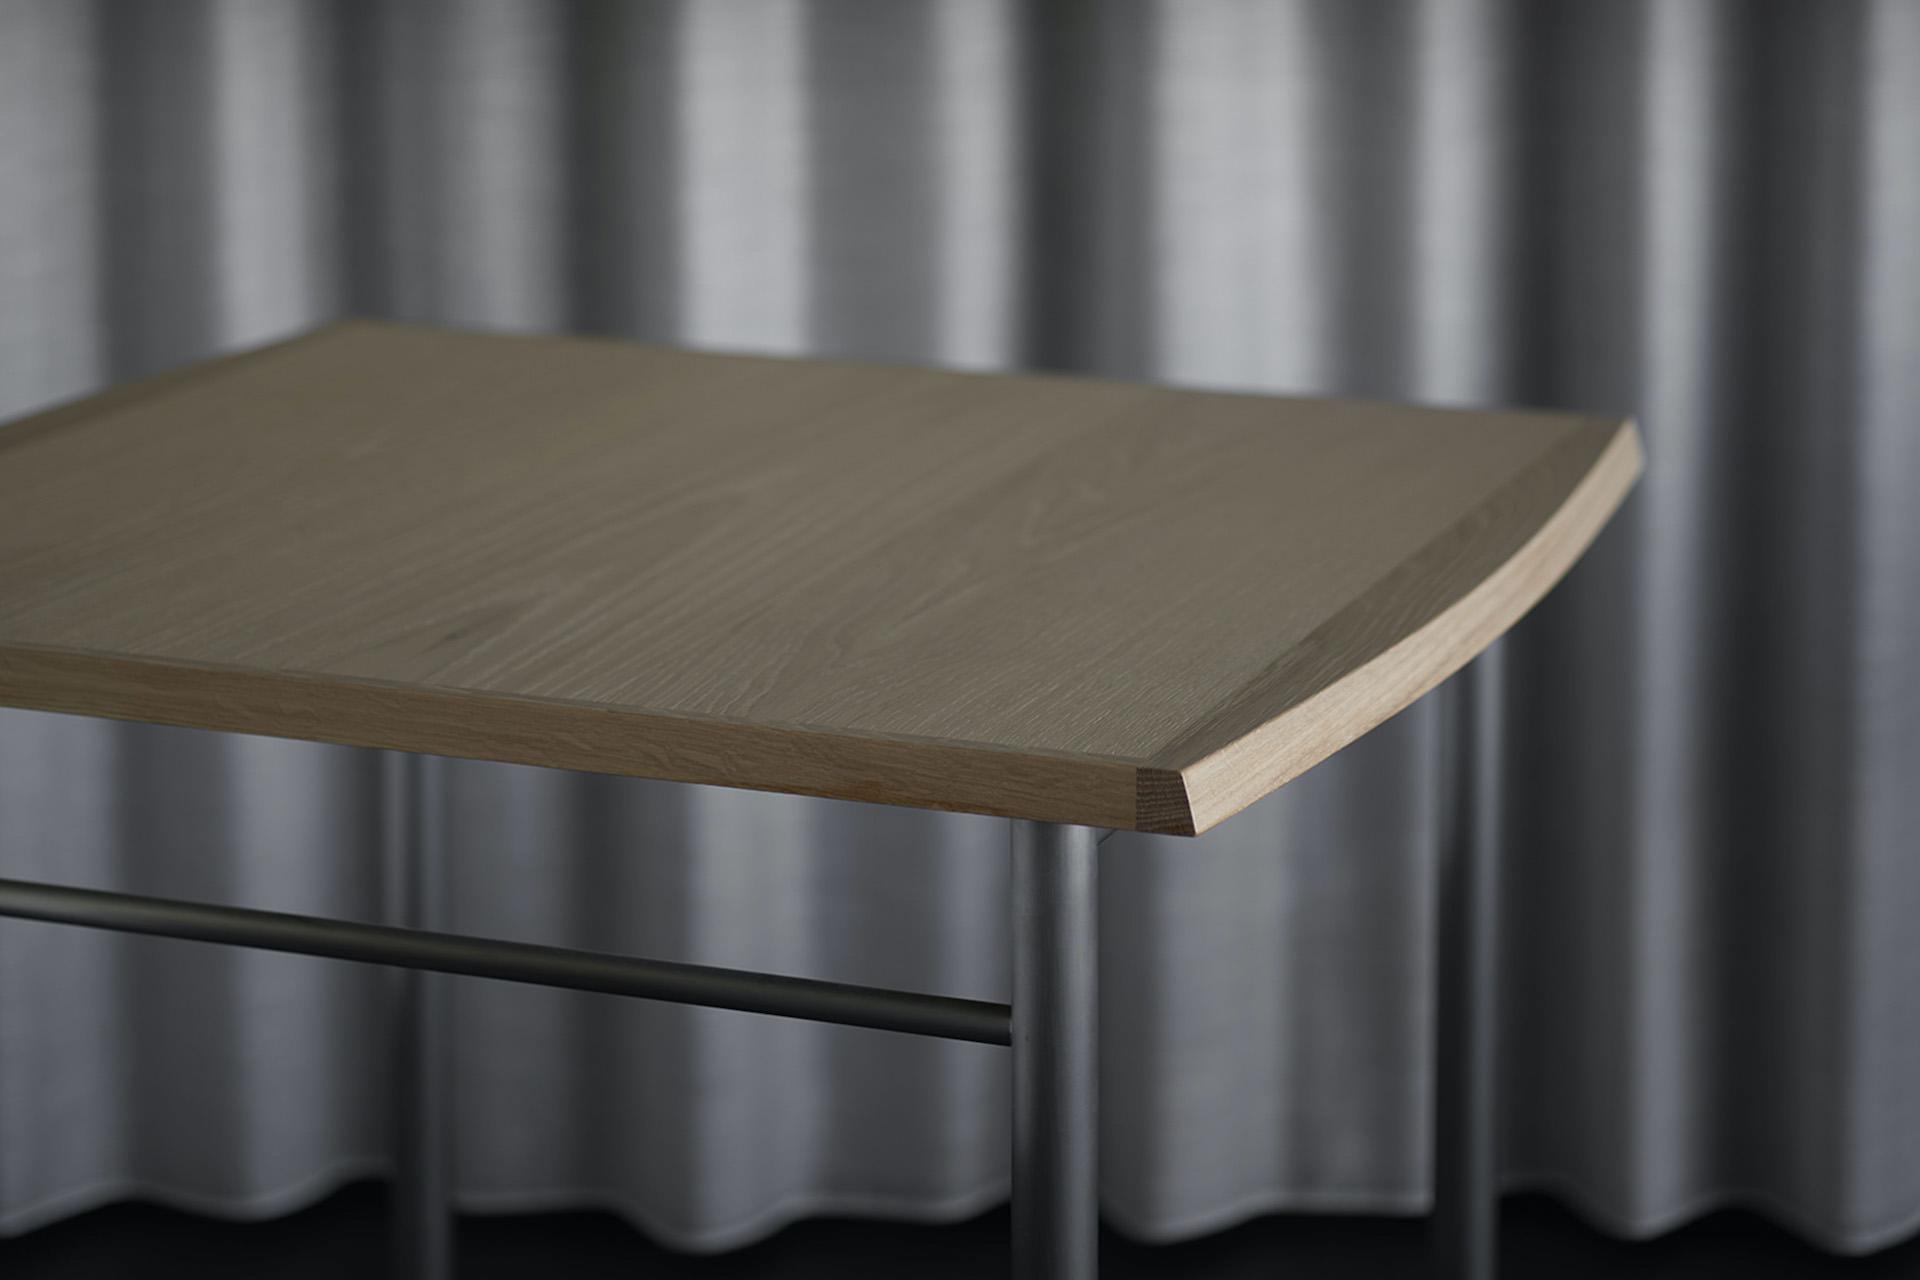 LB CHAIR | LB TABLE